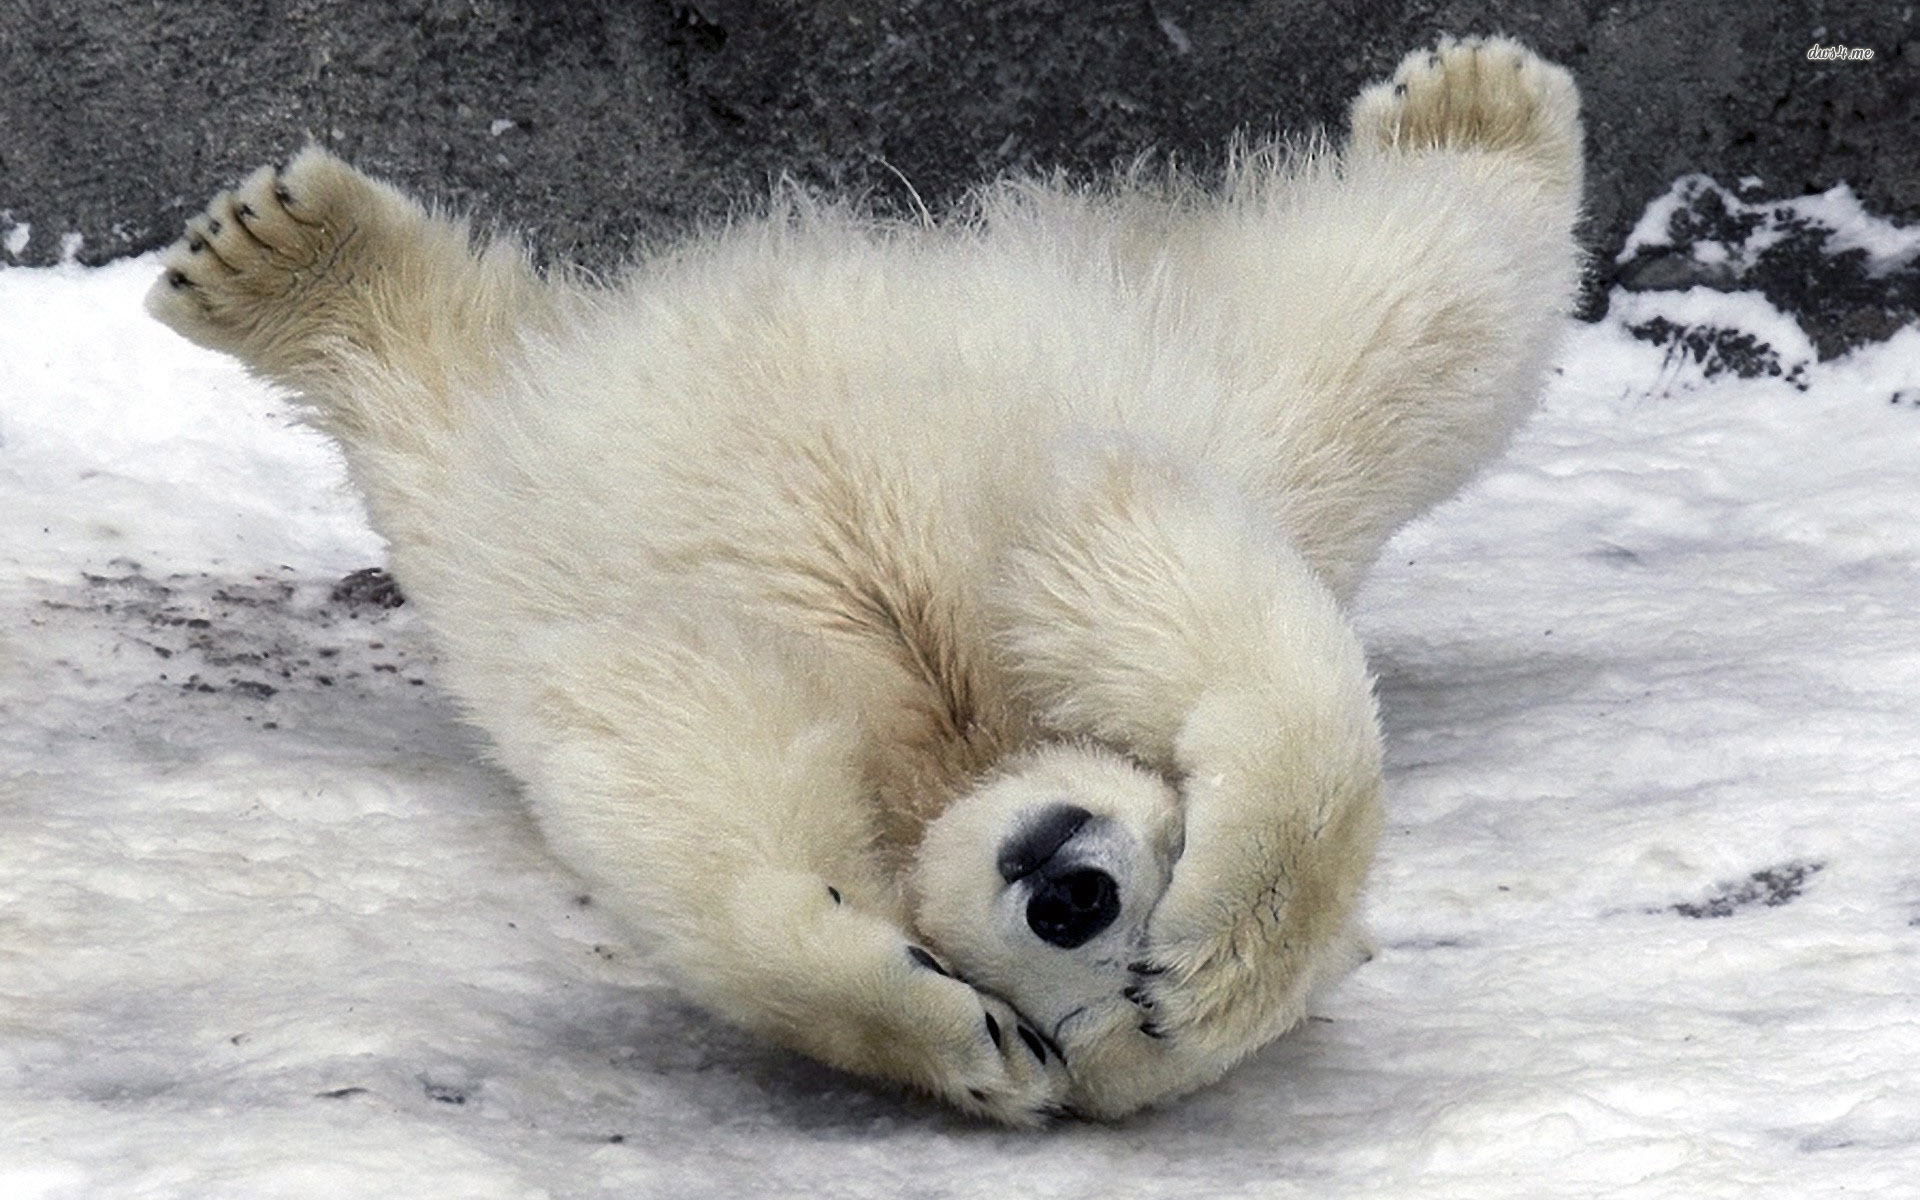 Baby Polar Bear Wallpaper ·① WallpaperTag